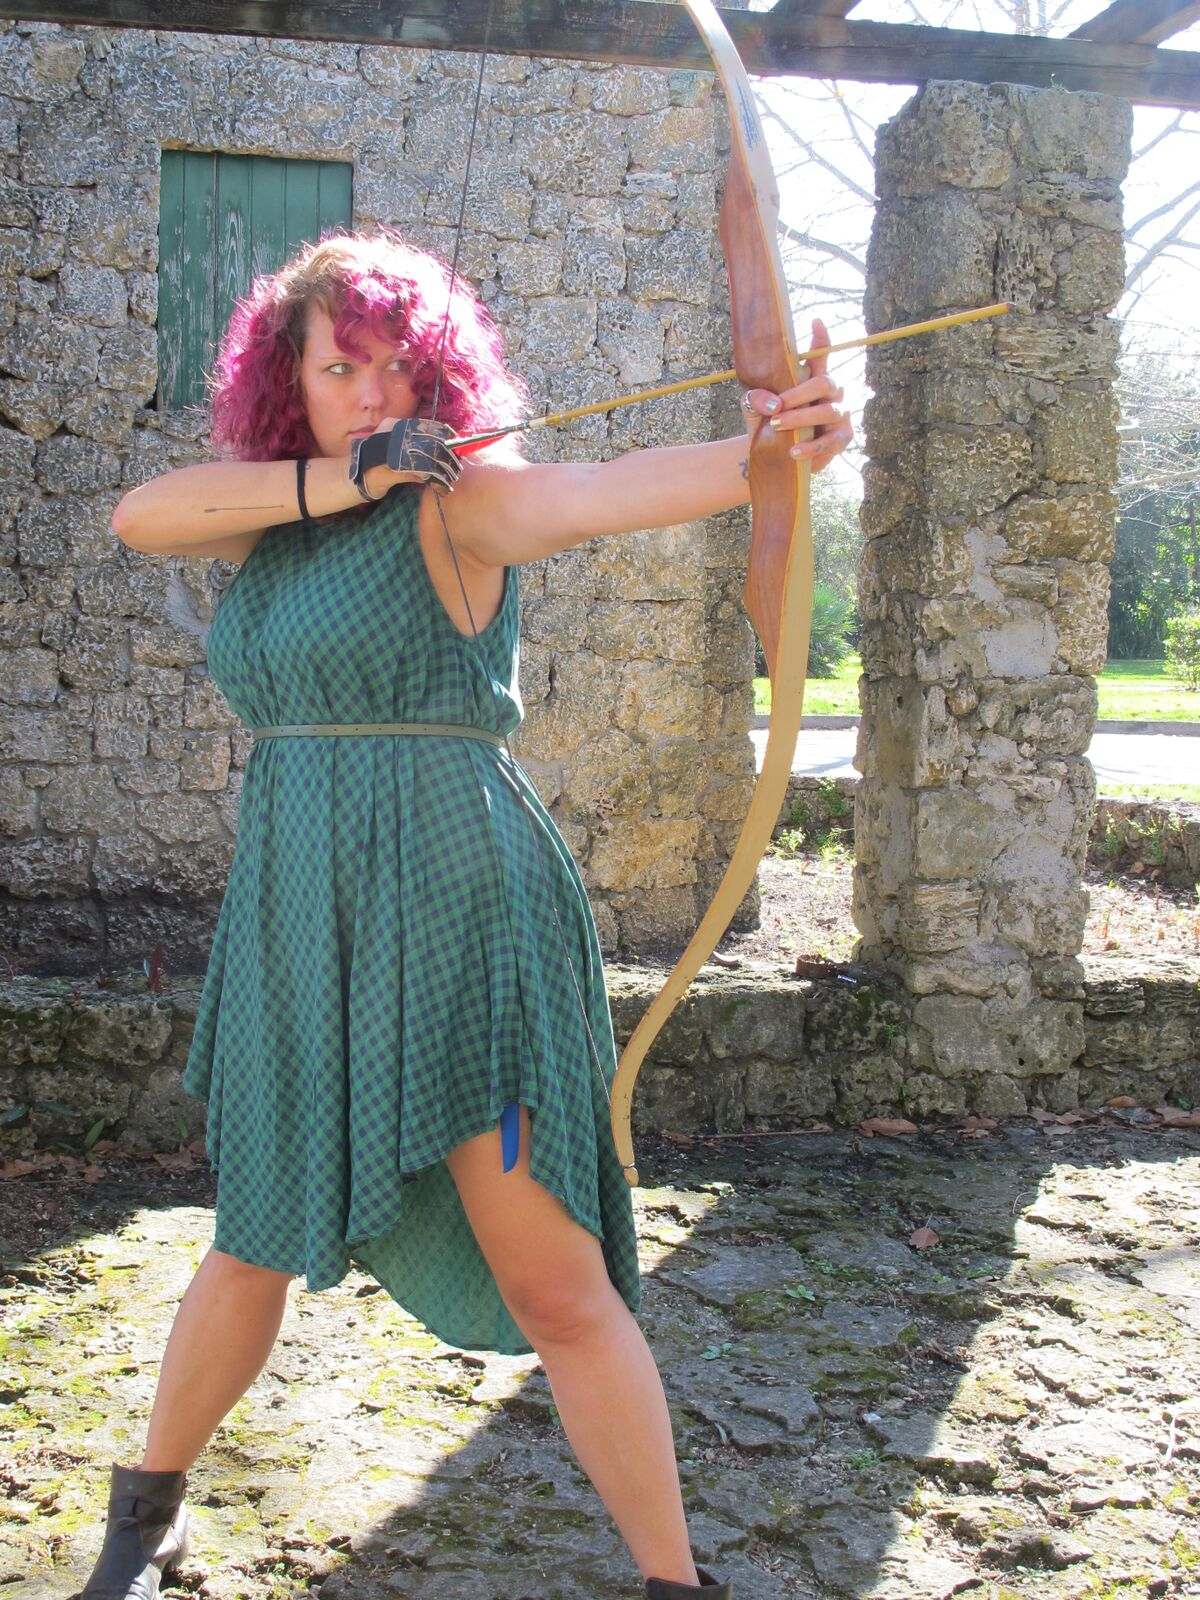 Disney Princess boot Camp Merida week archery fitness blog post